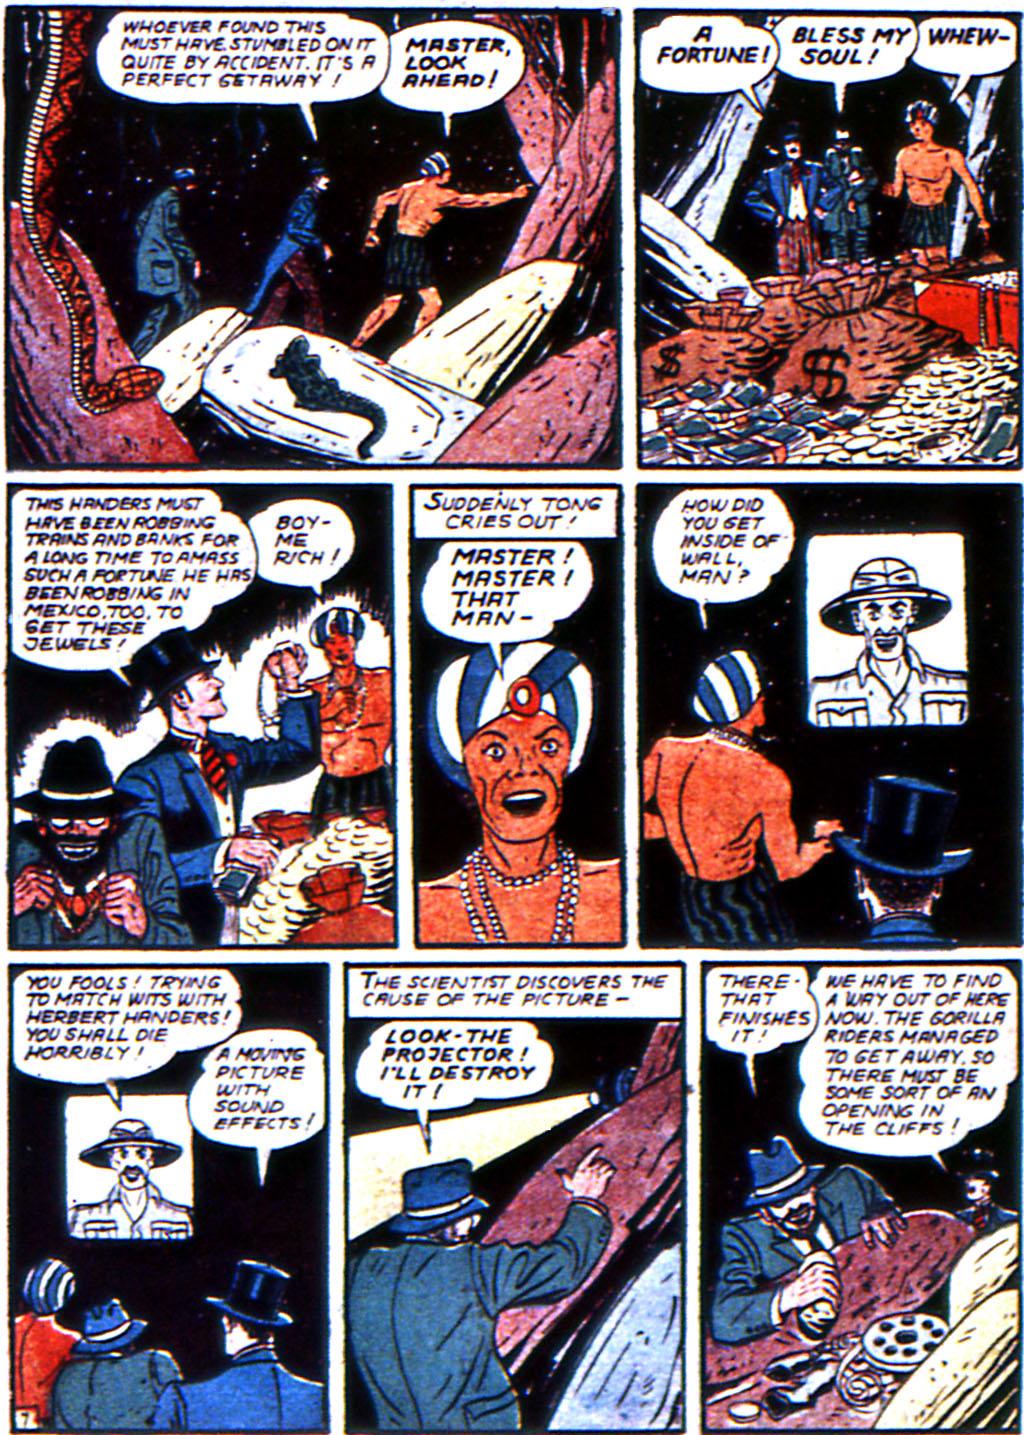 Action Comics 1938 Issue 19 | Viewcomic reading comics